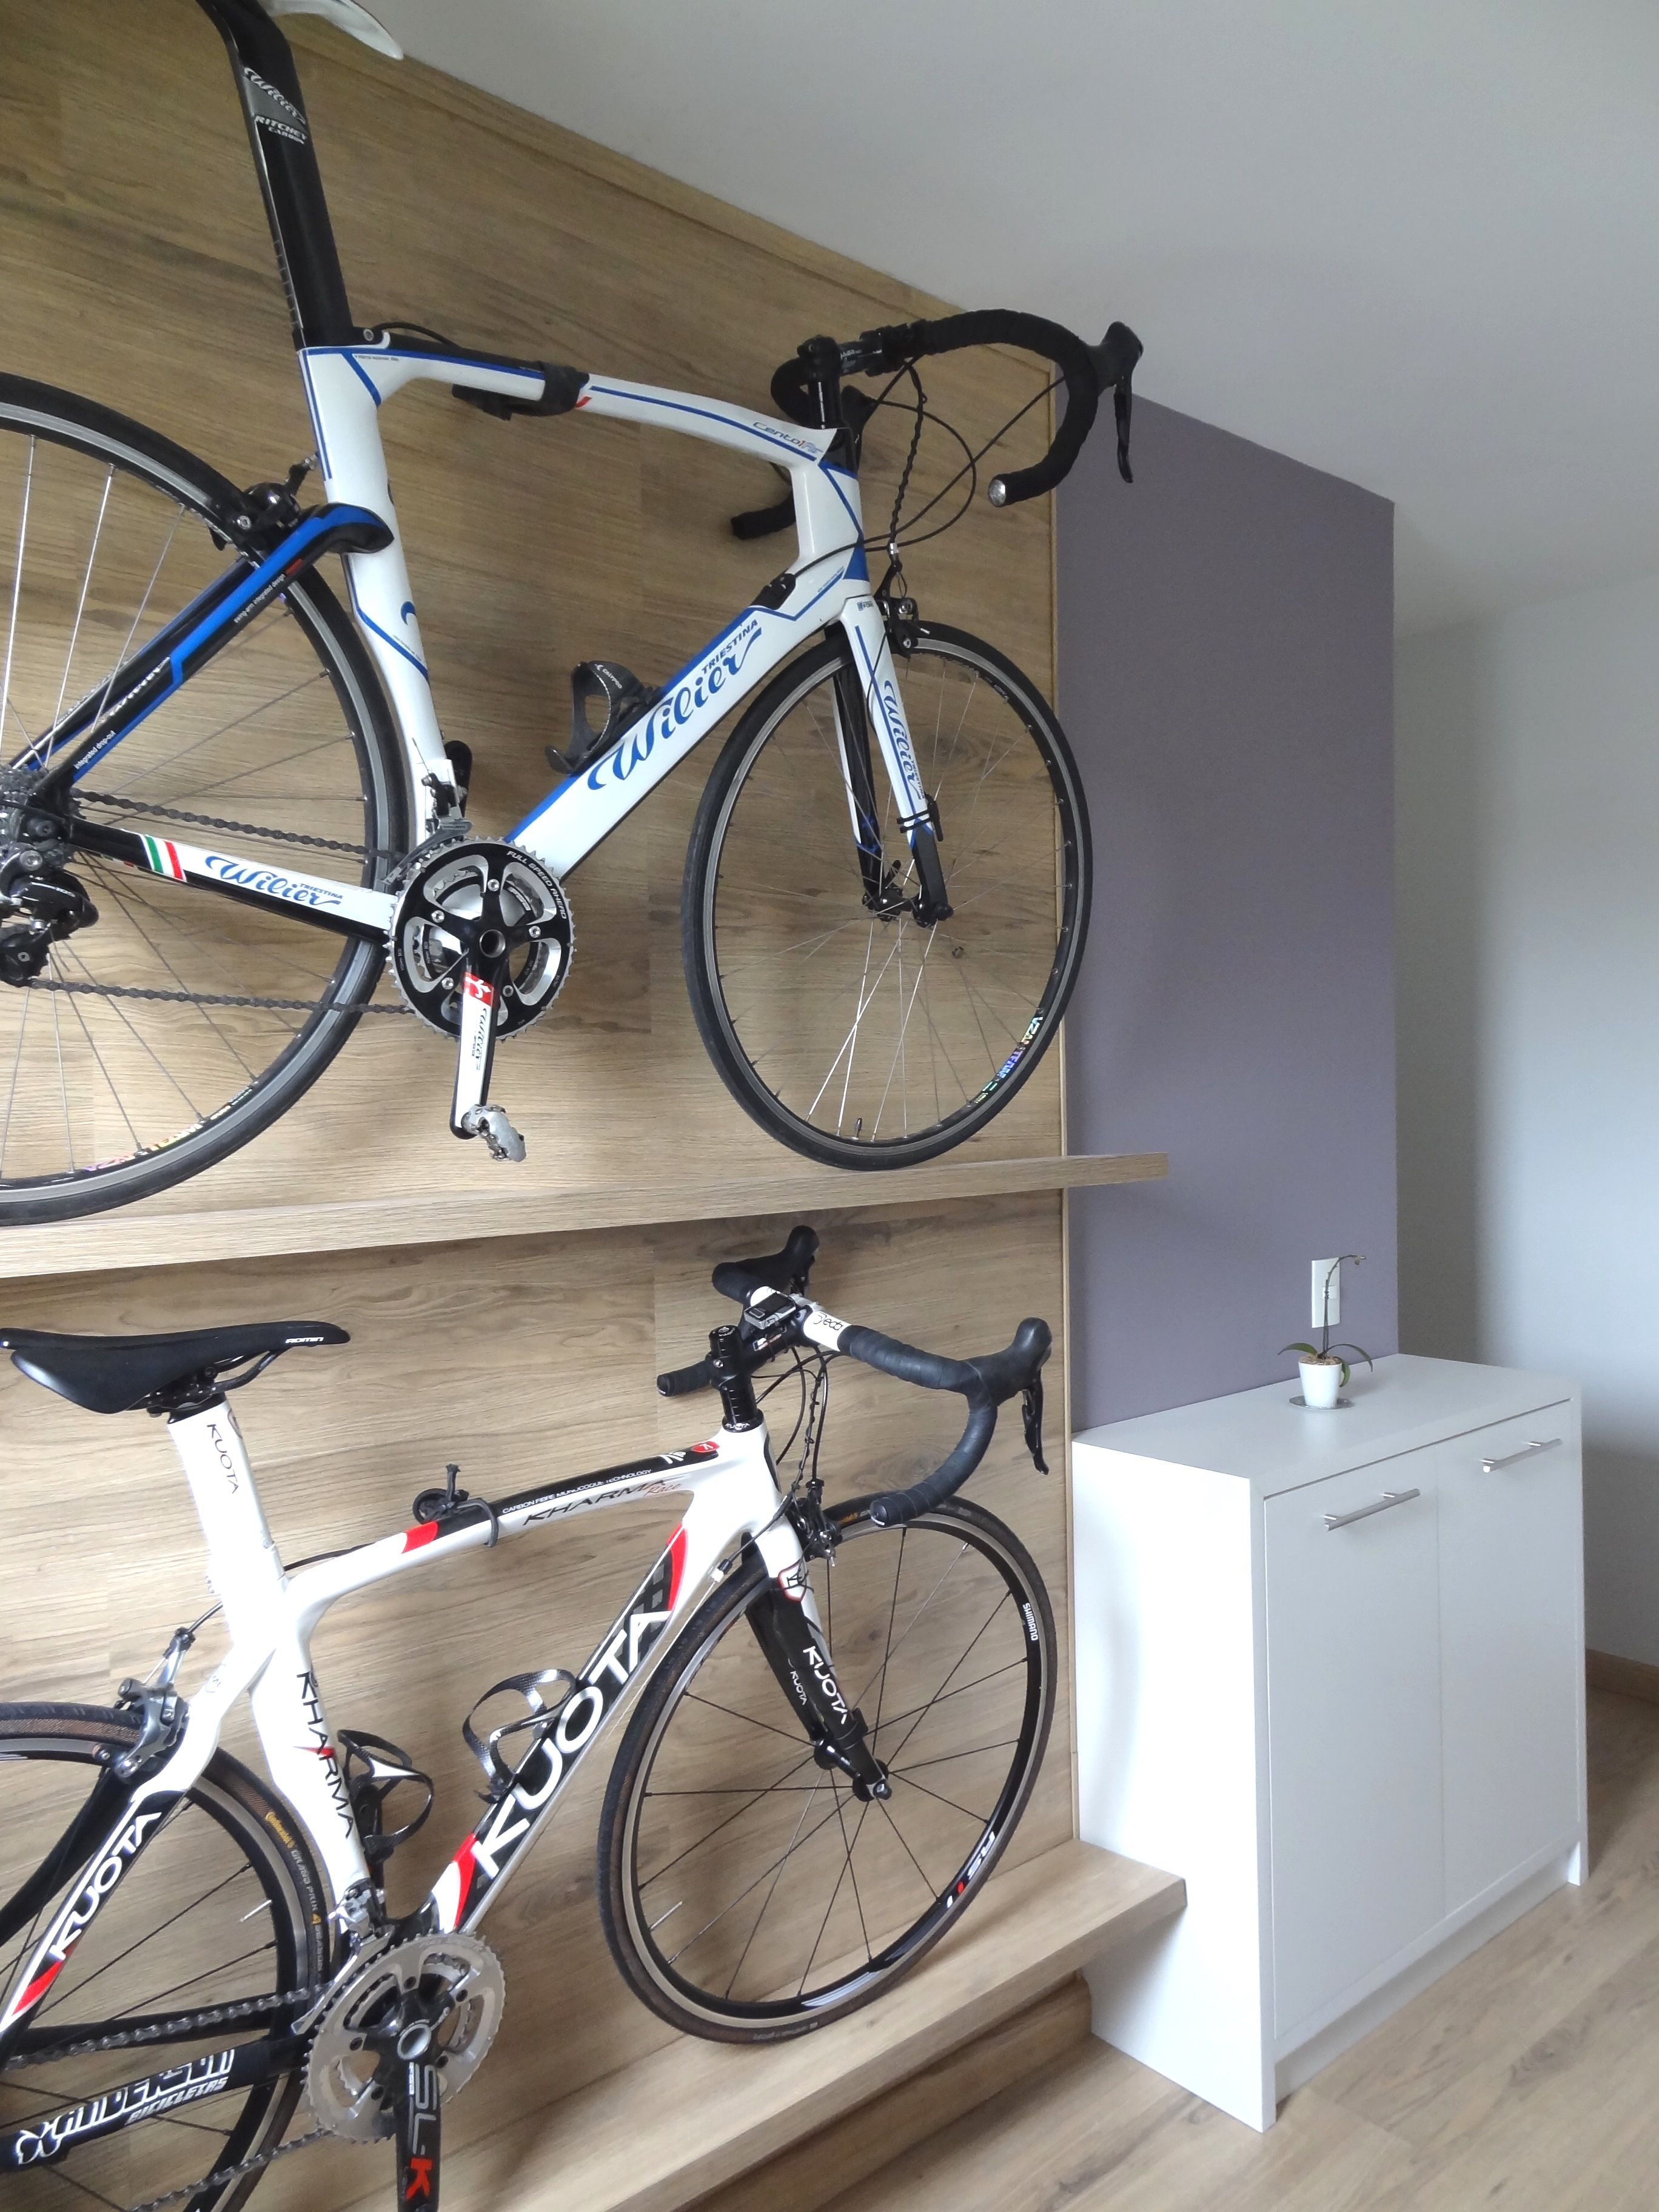 fresh modern at fantastical ideas decorating bike interior design garage marvelous furniture amazing for racks ceiling home rack